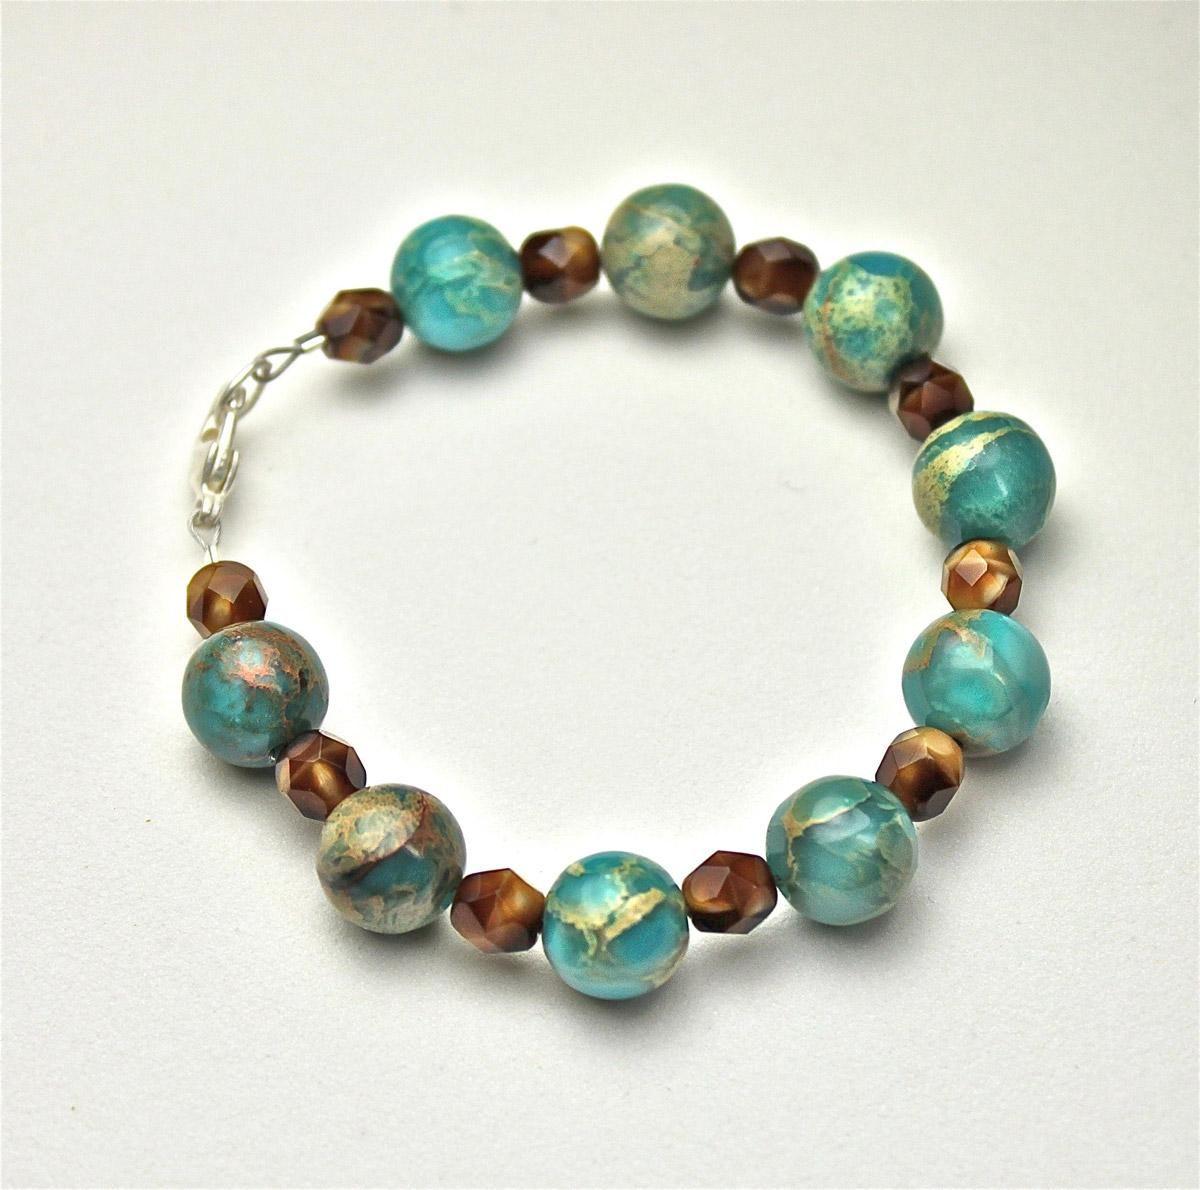 large bead bracelet | I can do it too | Pinterest | Bracelets ...